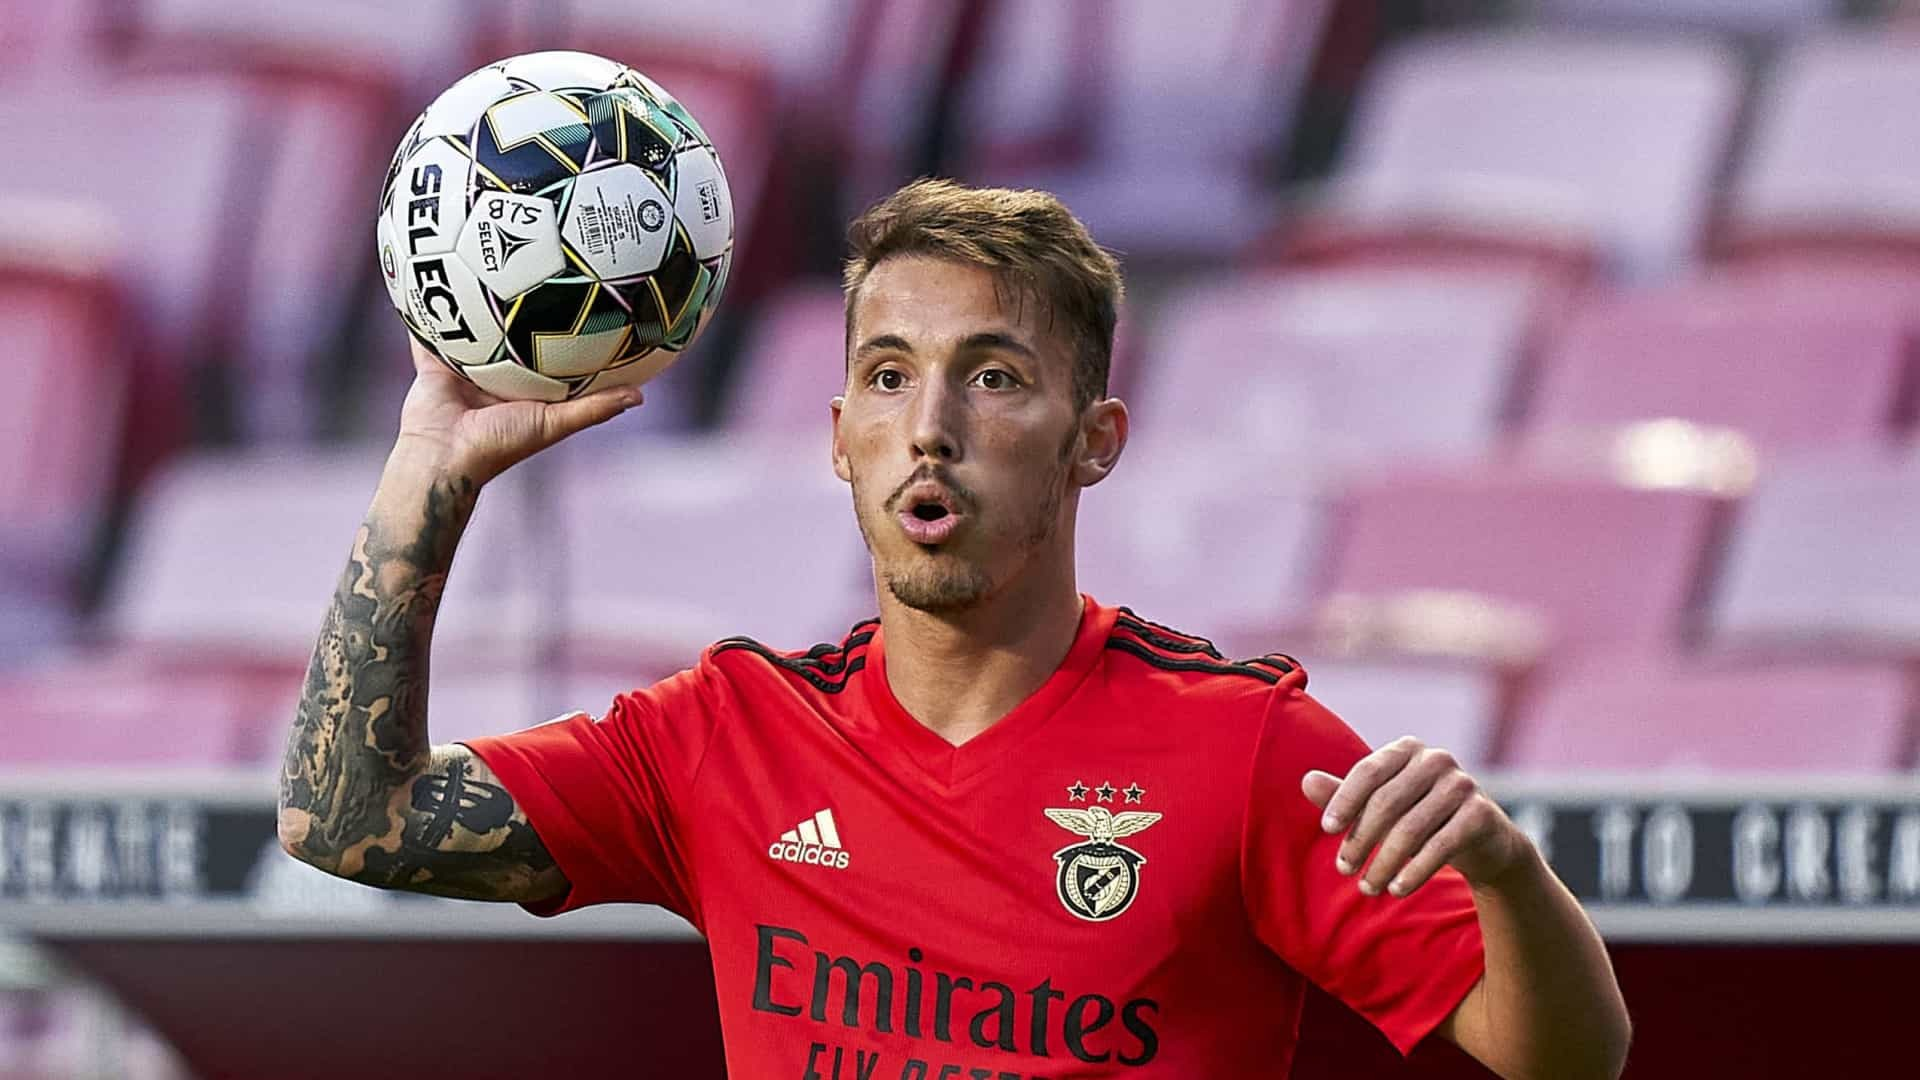 MU took Nuno Mendes, Arsenal bought Hakimi